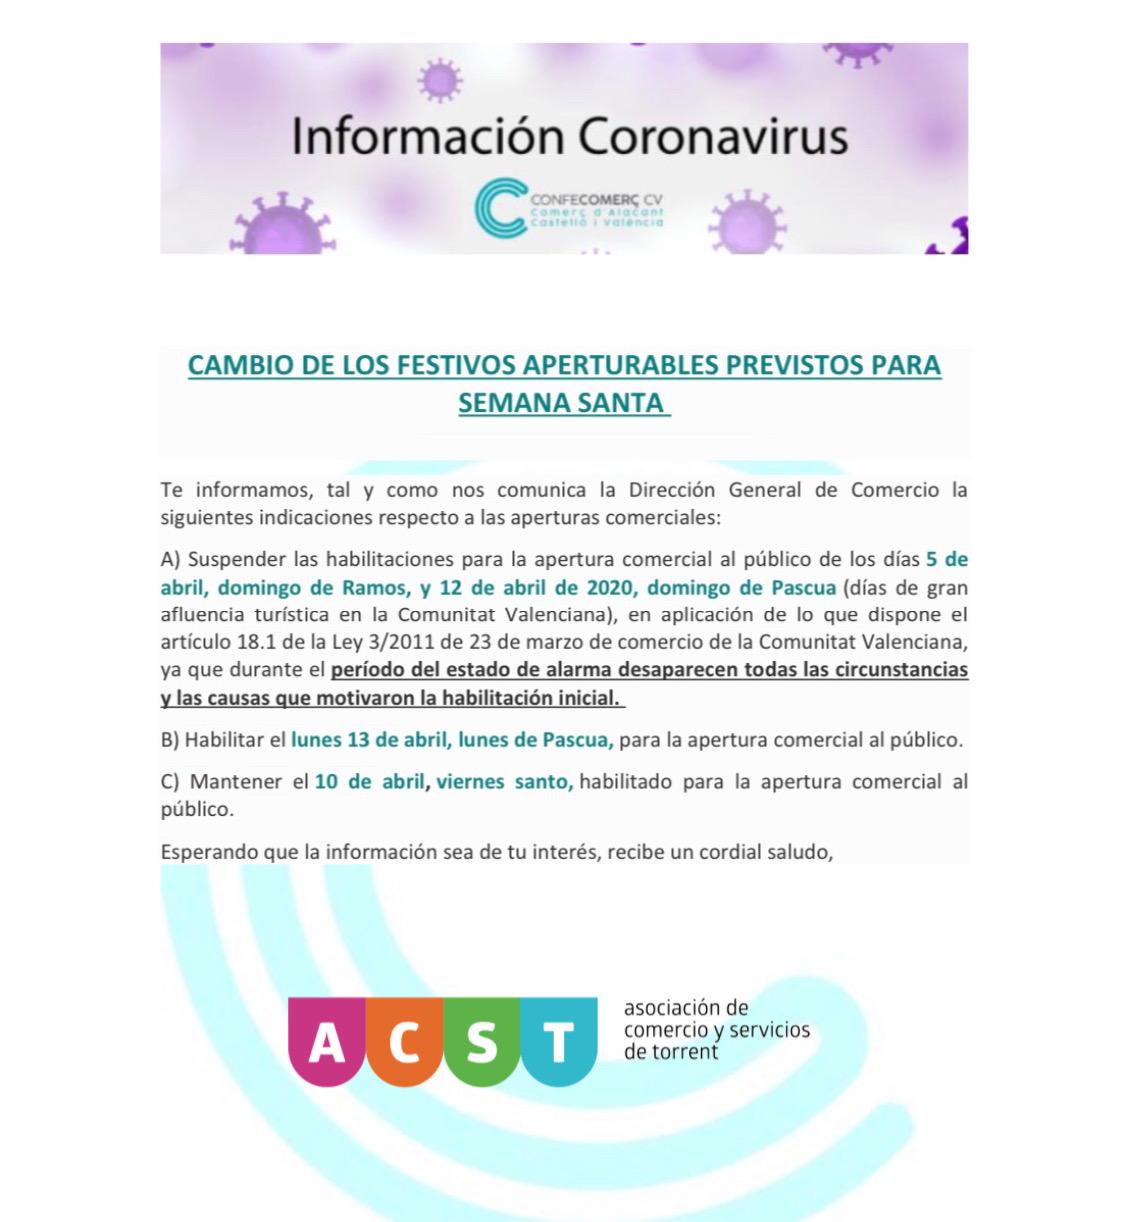 Cambios Festivos Aperturables (Info Oficial) !!